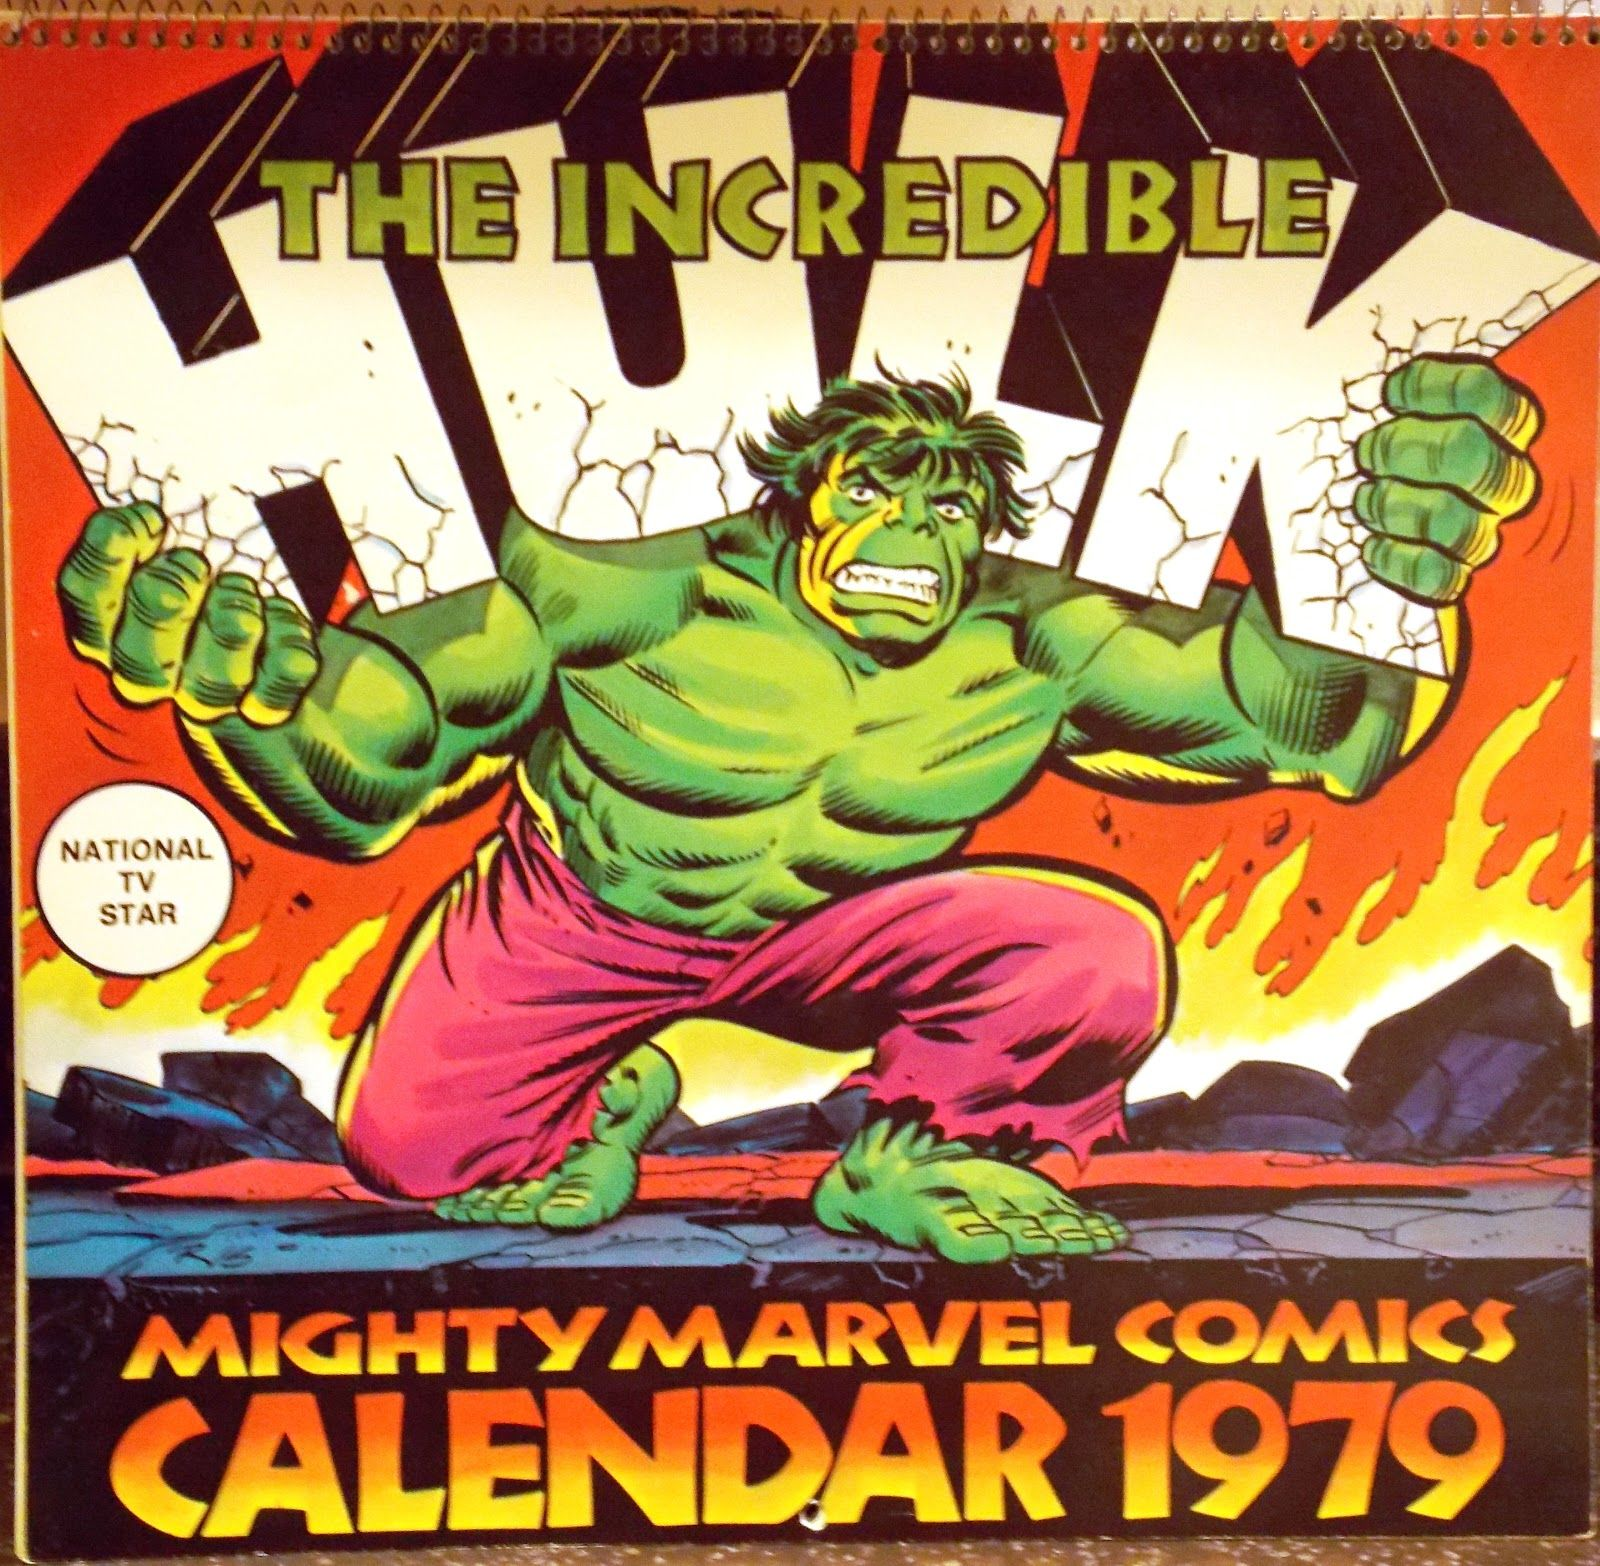 Marvel 1979 Calendar Comic Book Shop The Incredibles